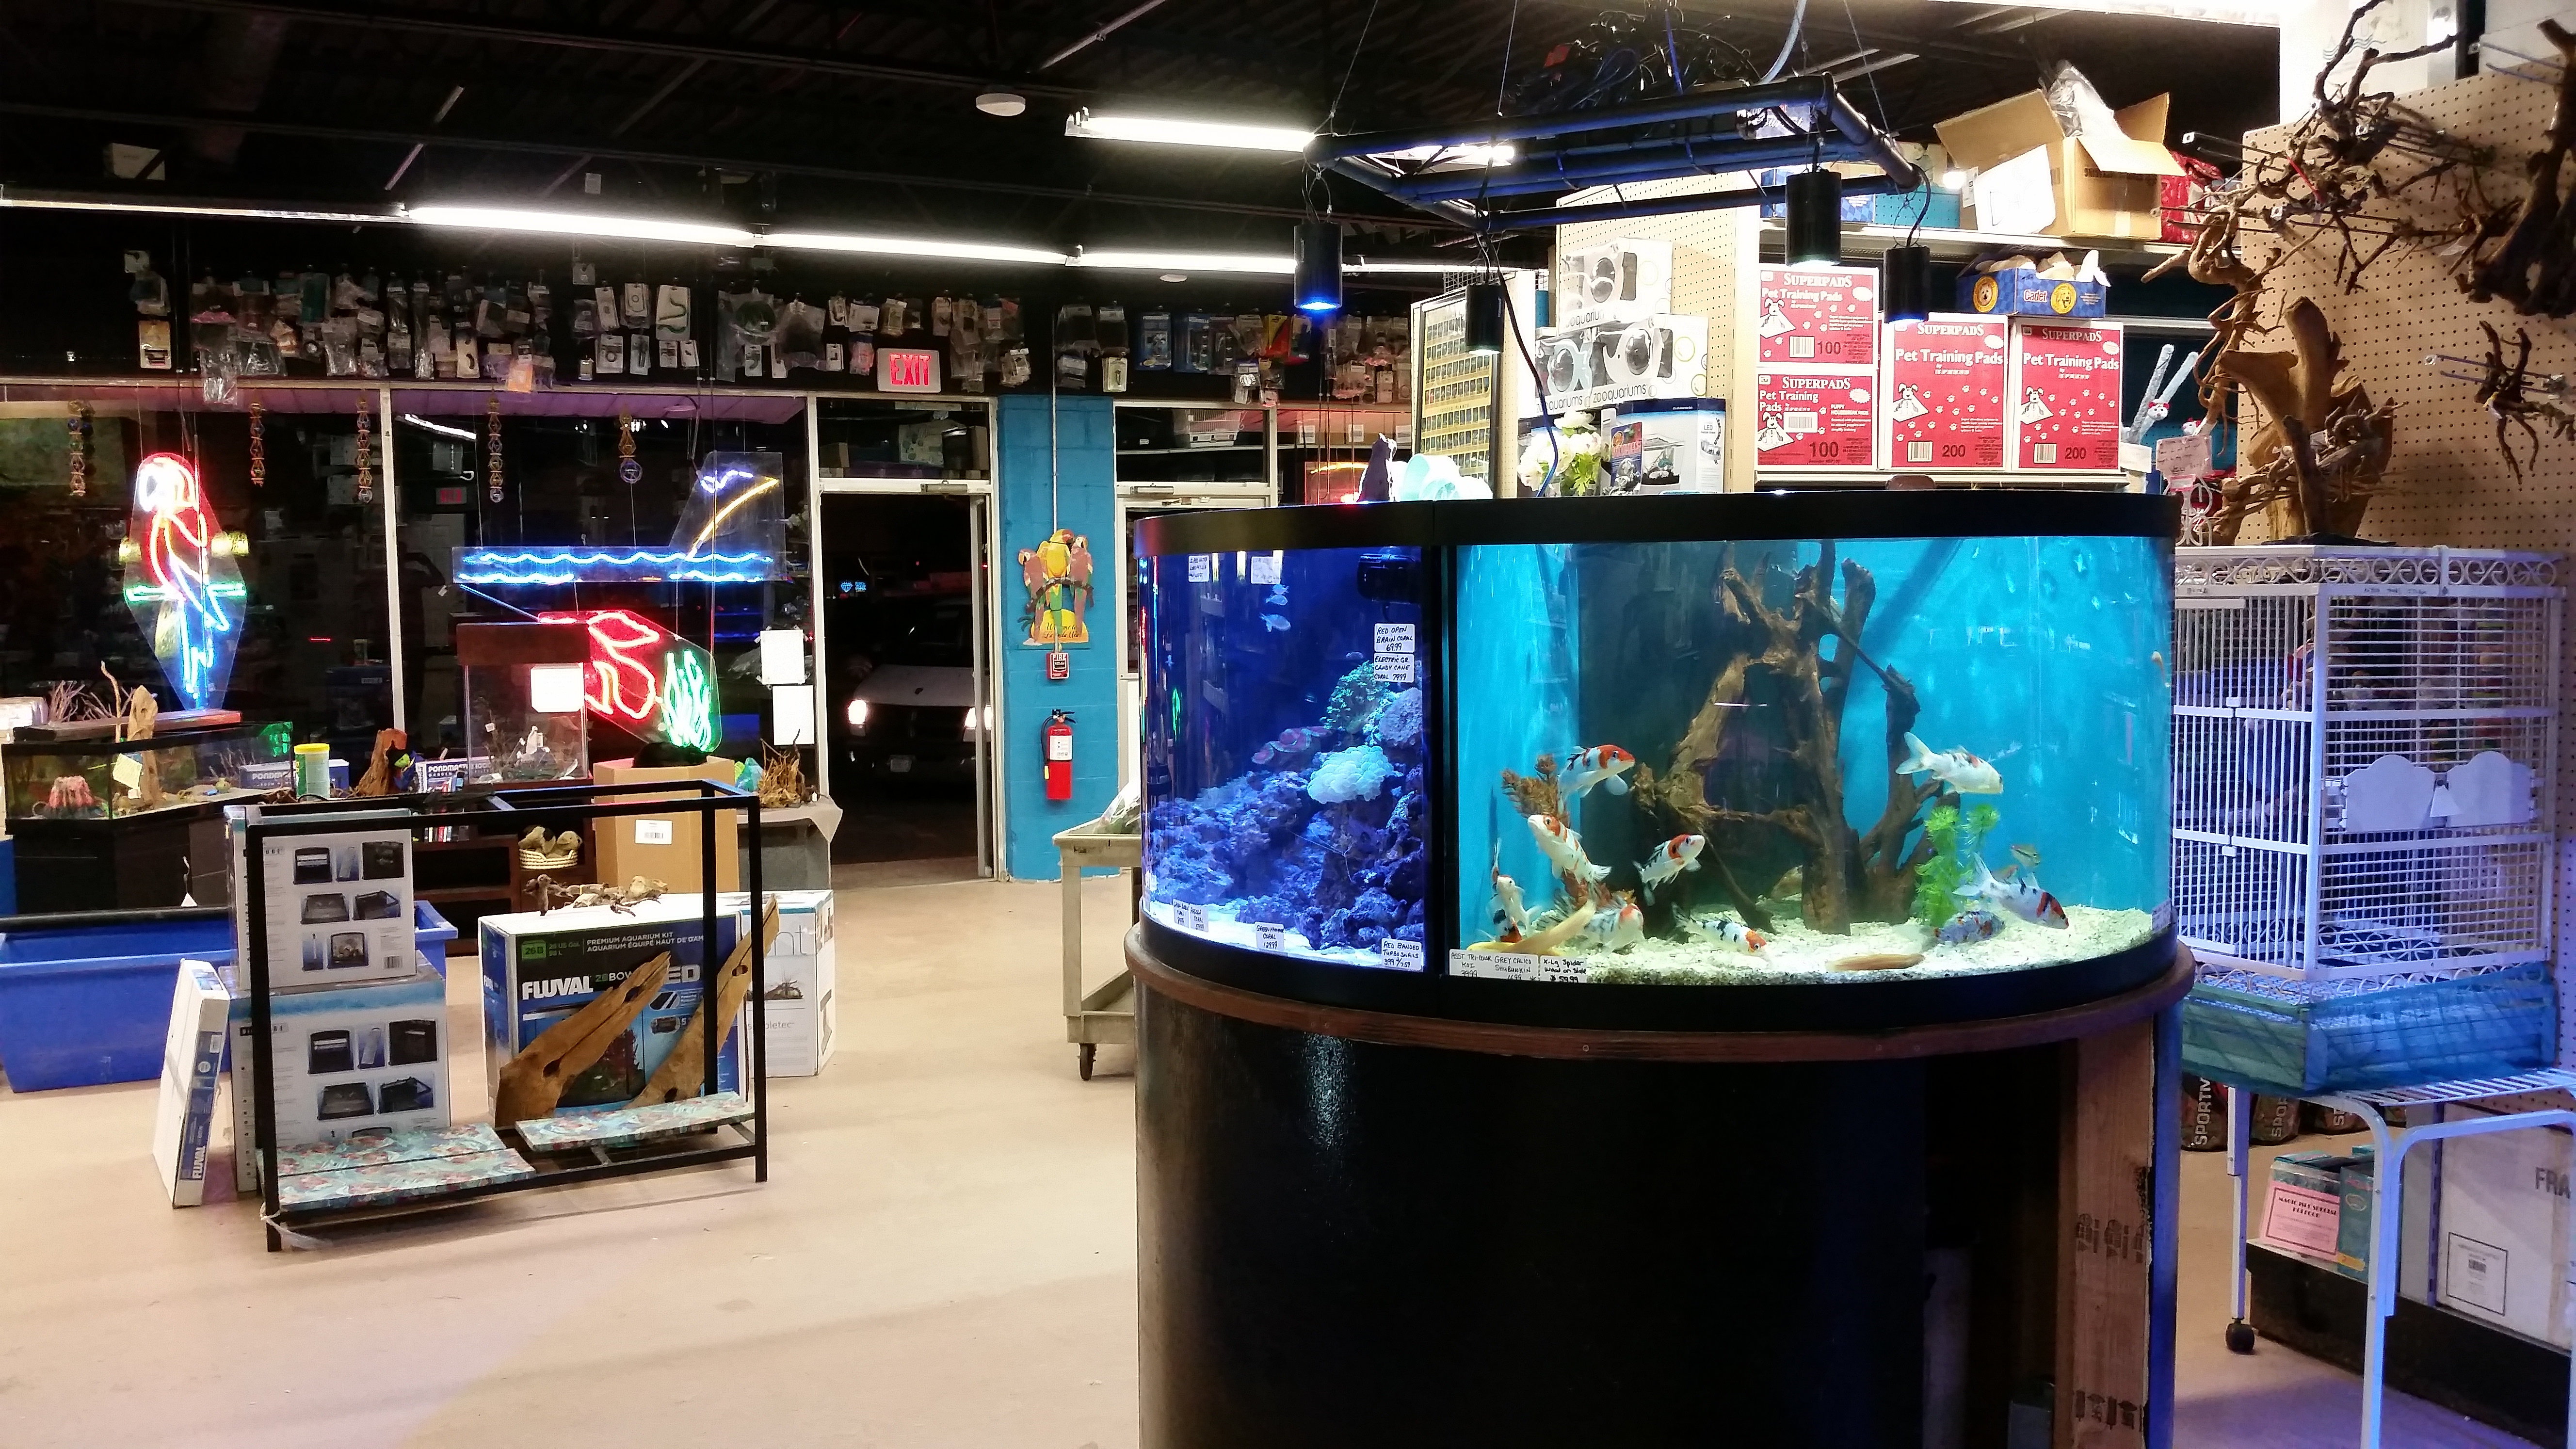 Freshwater fish store near me - 20141105_171859 Jpg